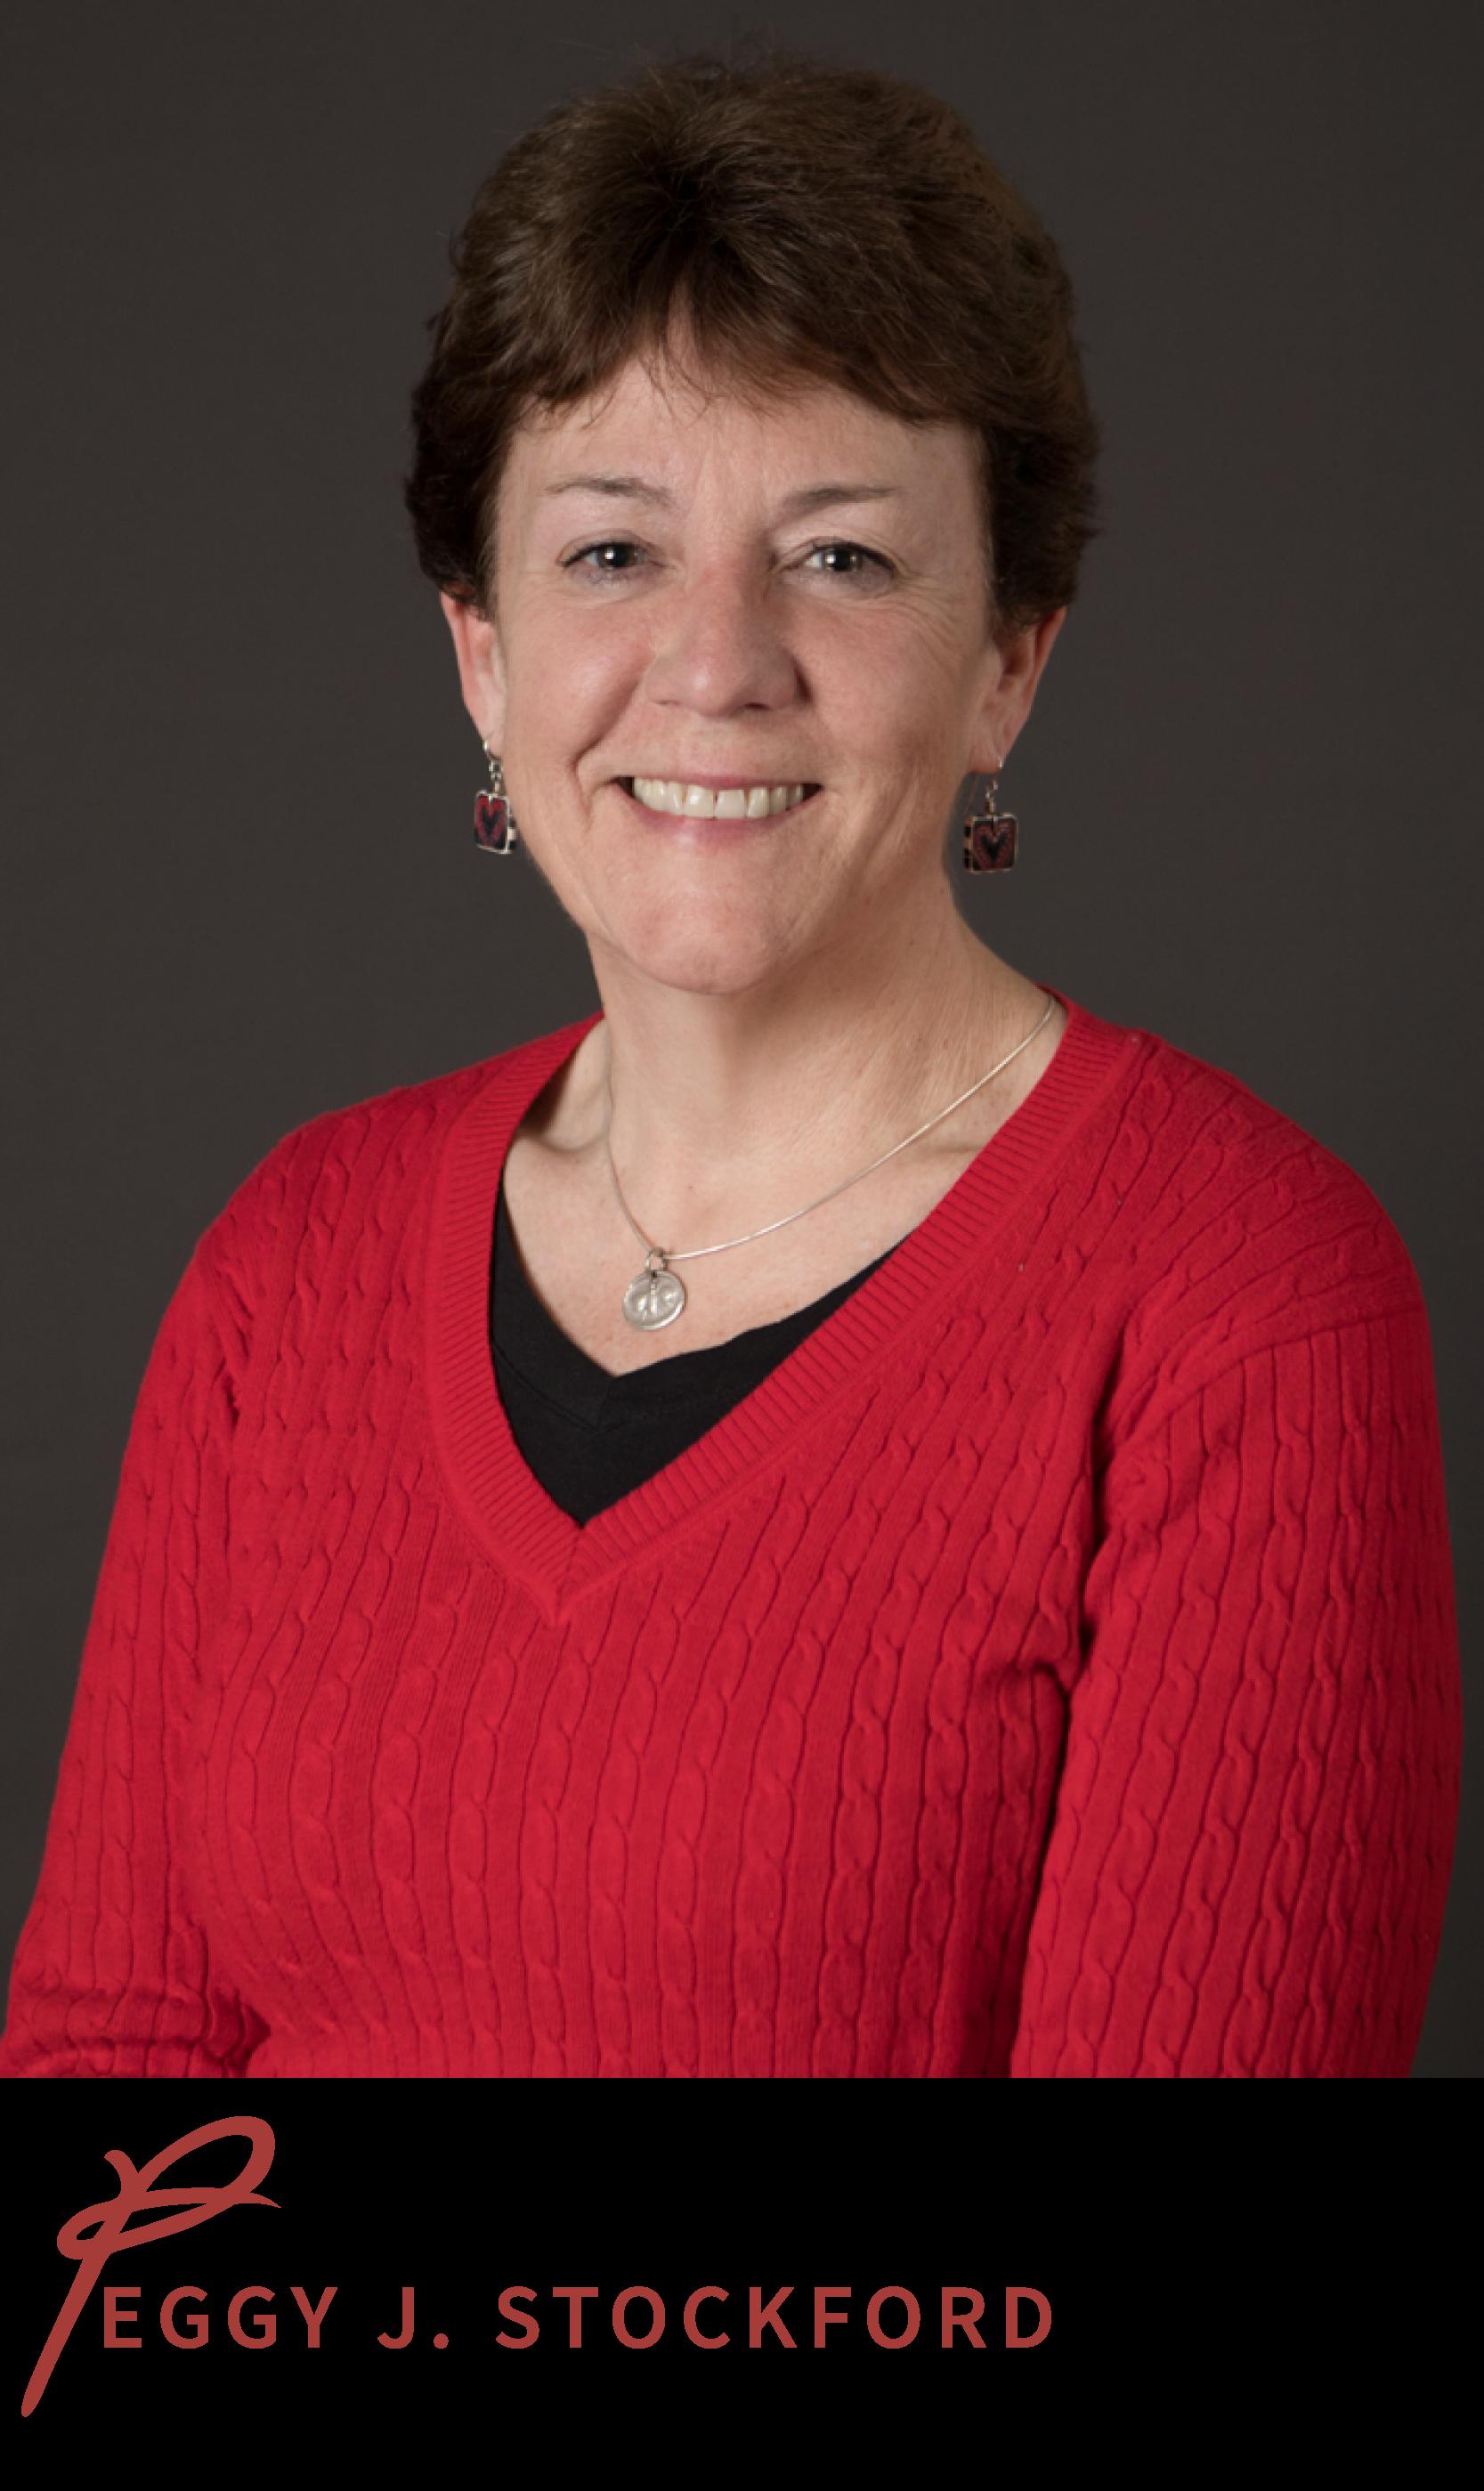 Peggy J. Stockford, MVP Litigation